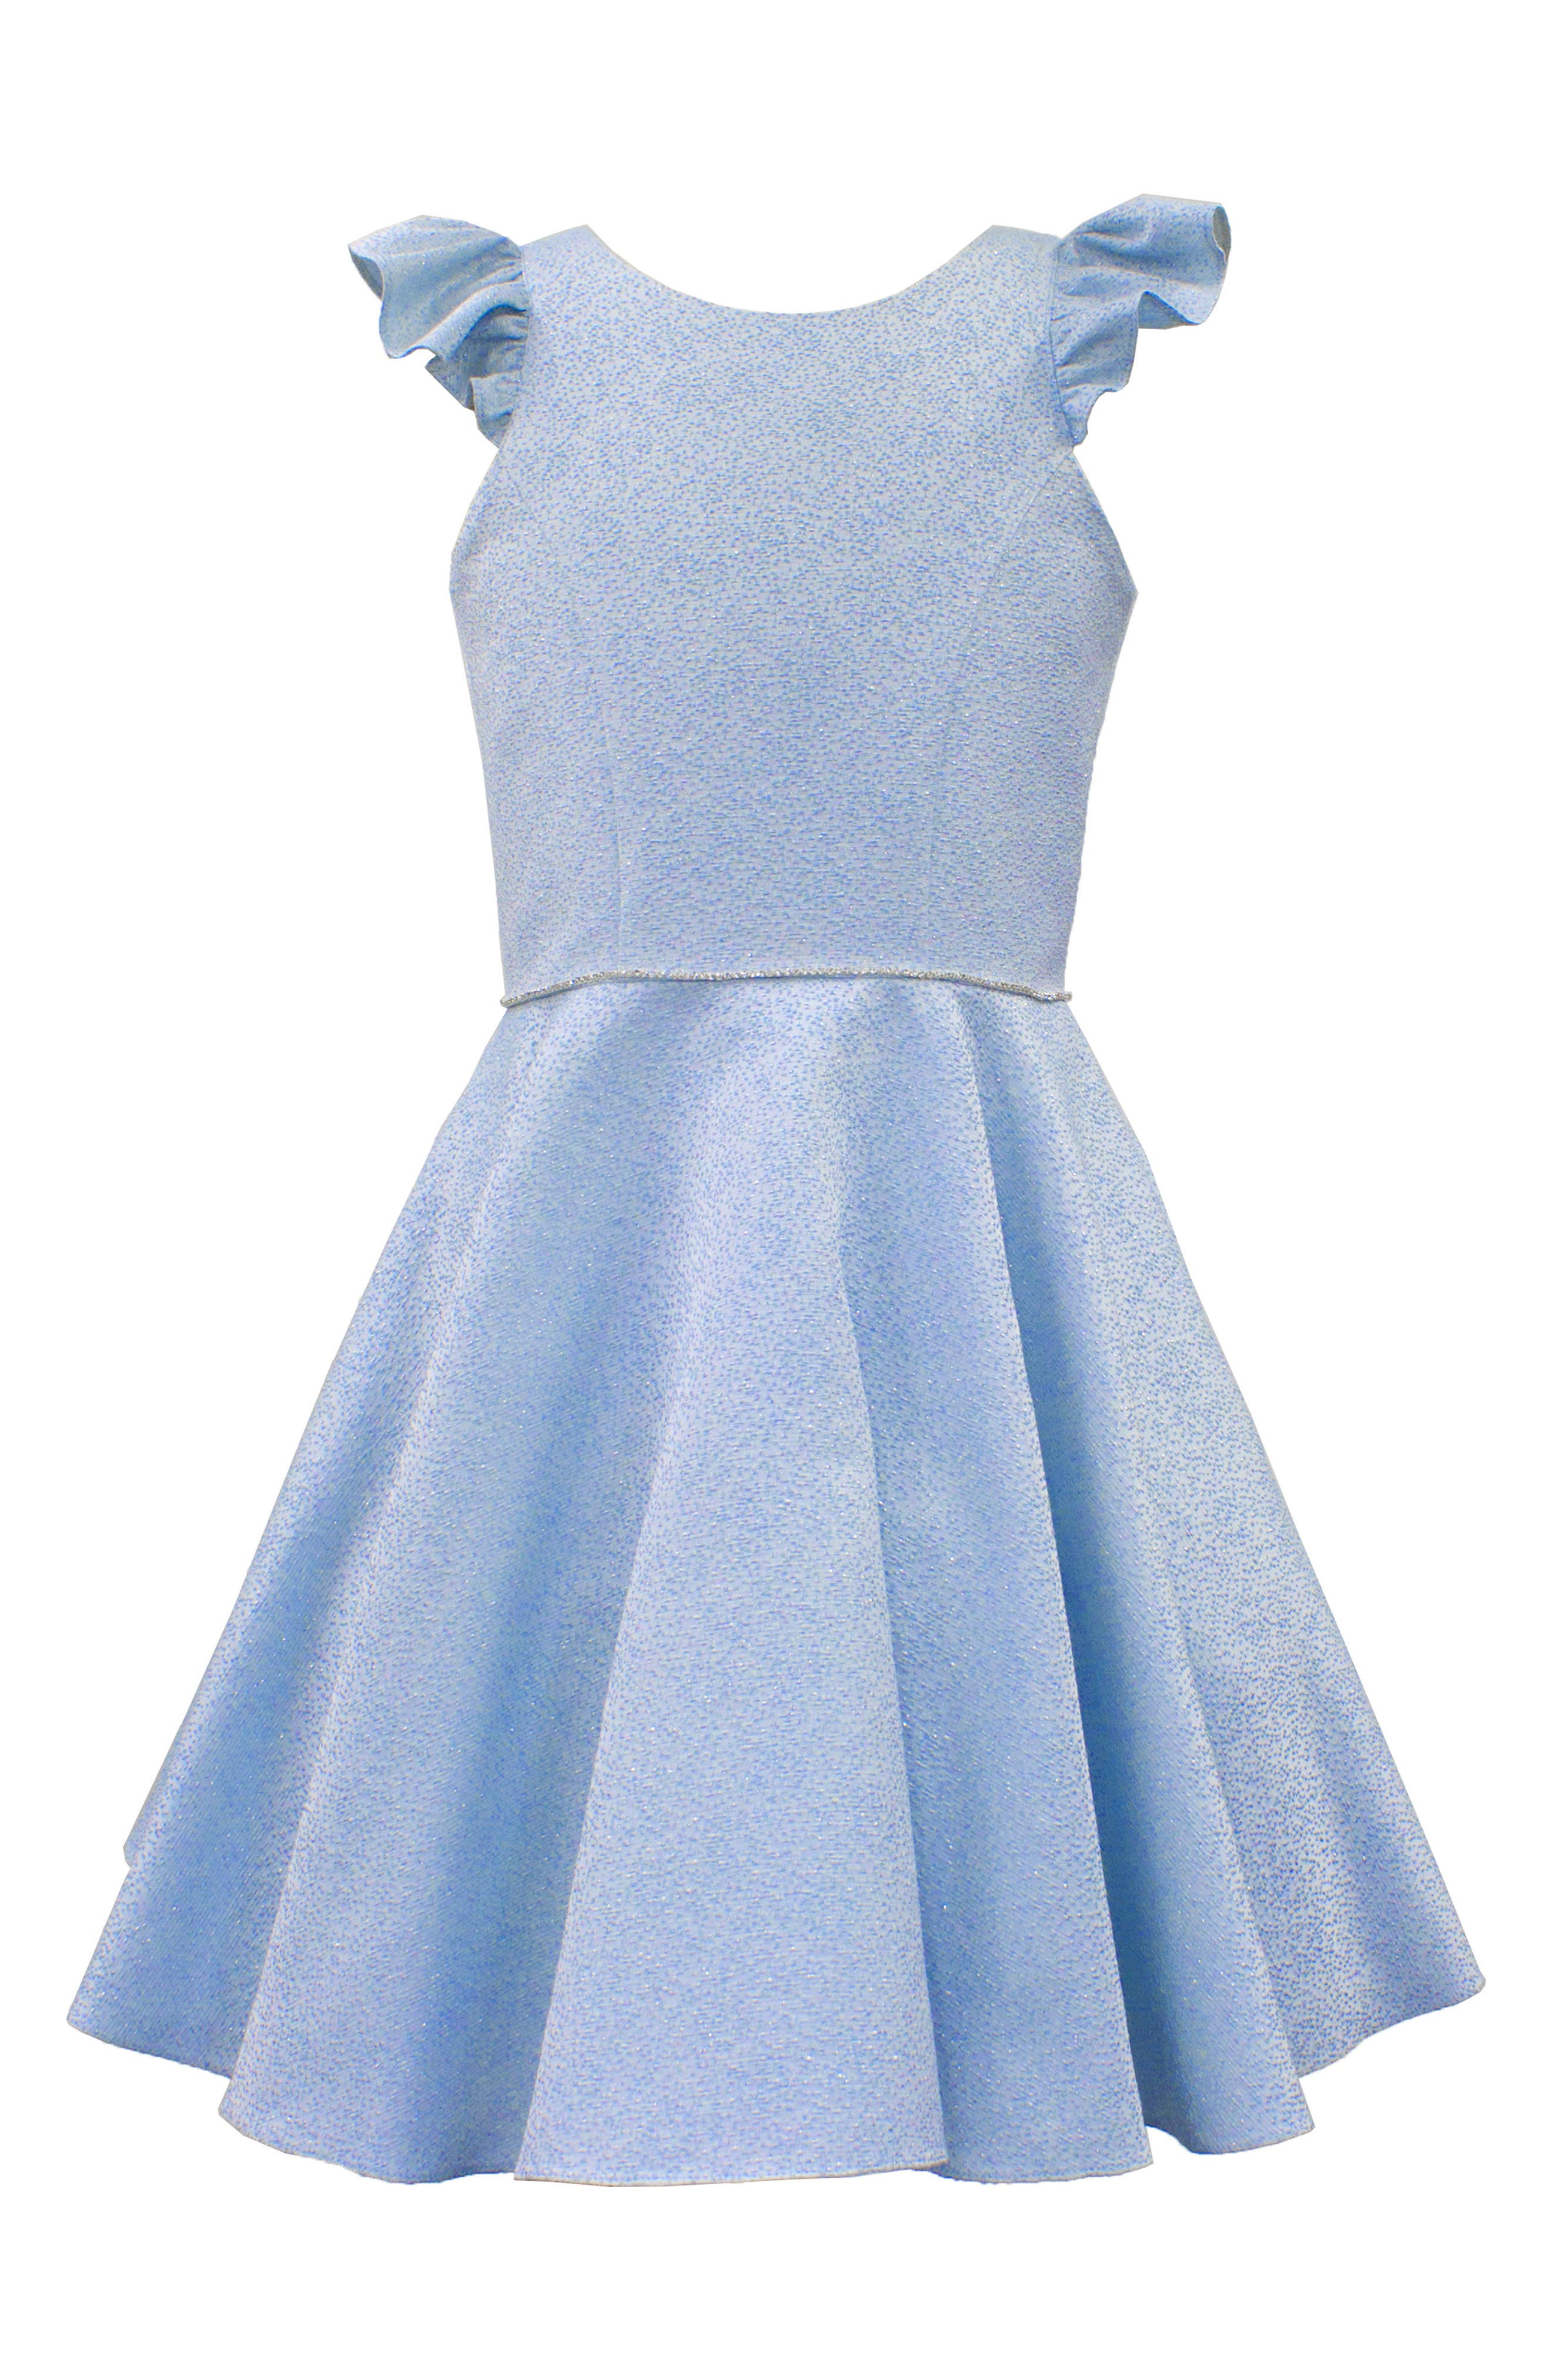 Starboard light cocktail dress